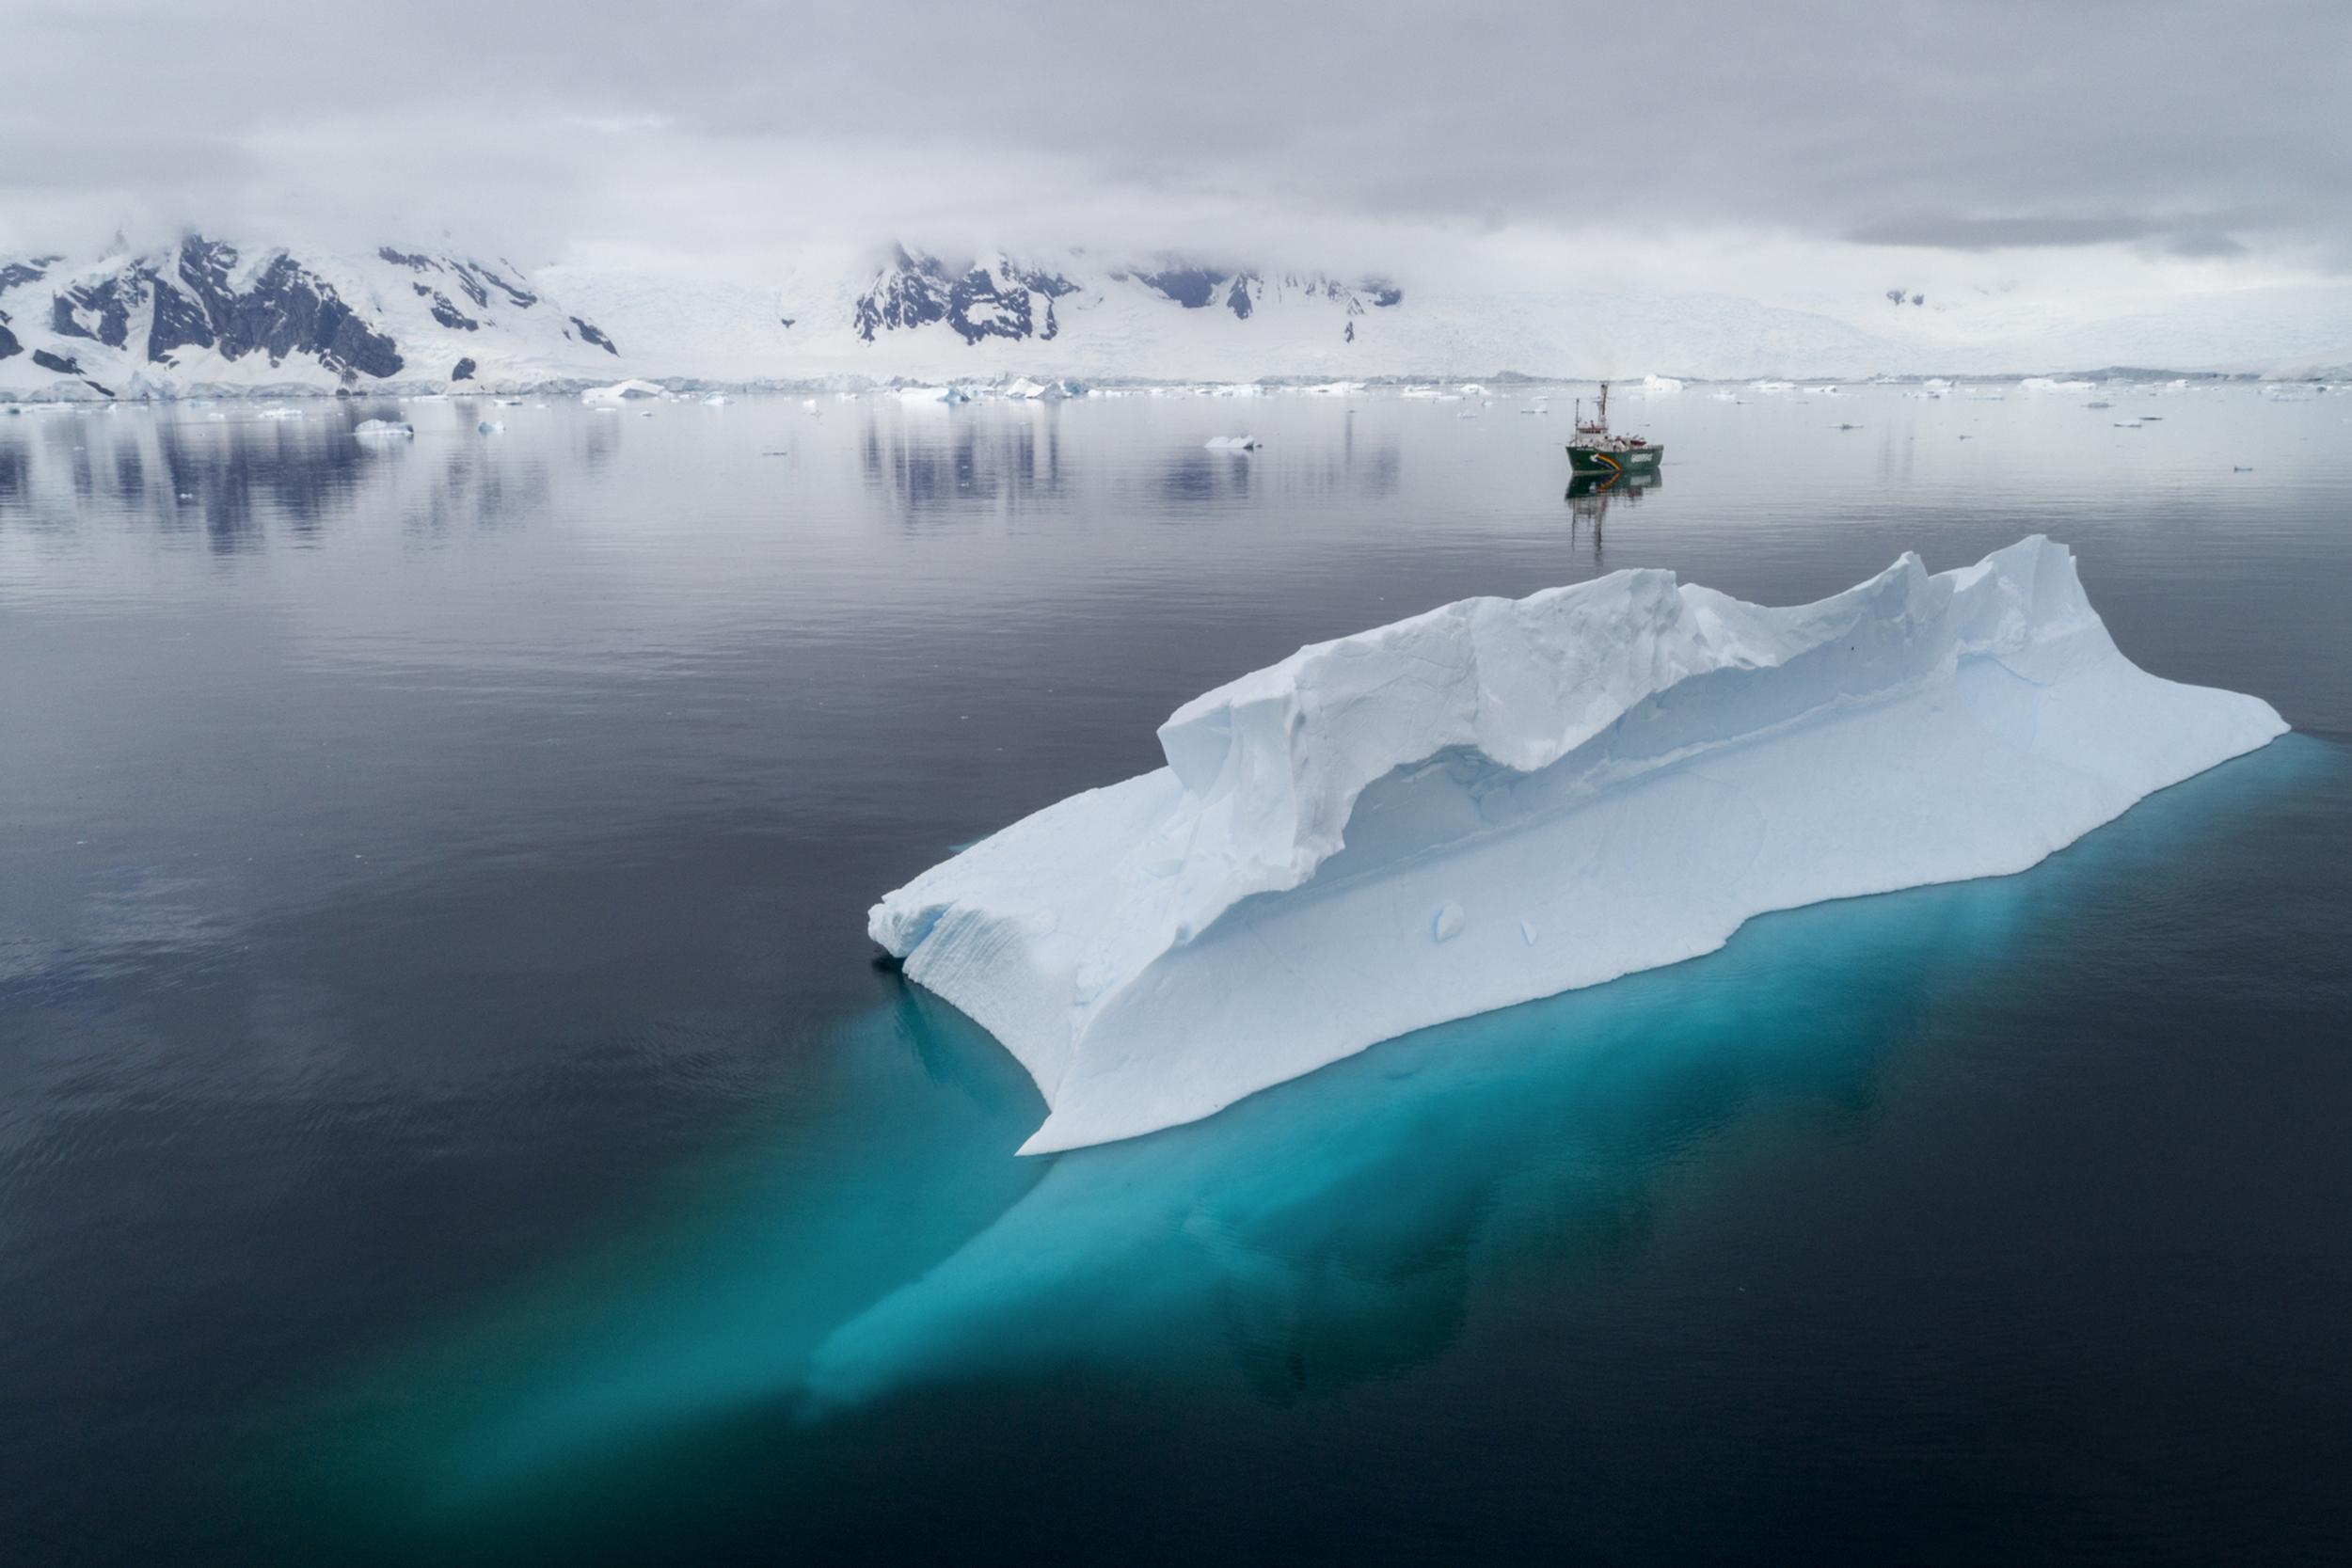 Greenpeace ship the Arctic Sunrise in Charlotte Bay, Antarctic Peninsula